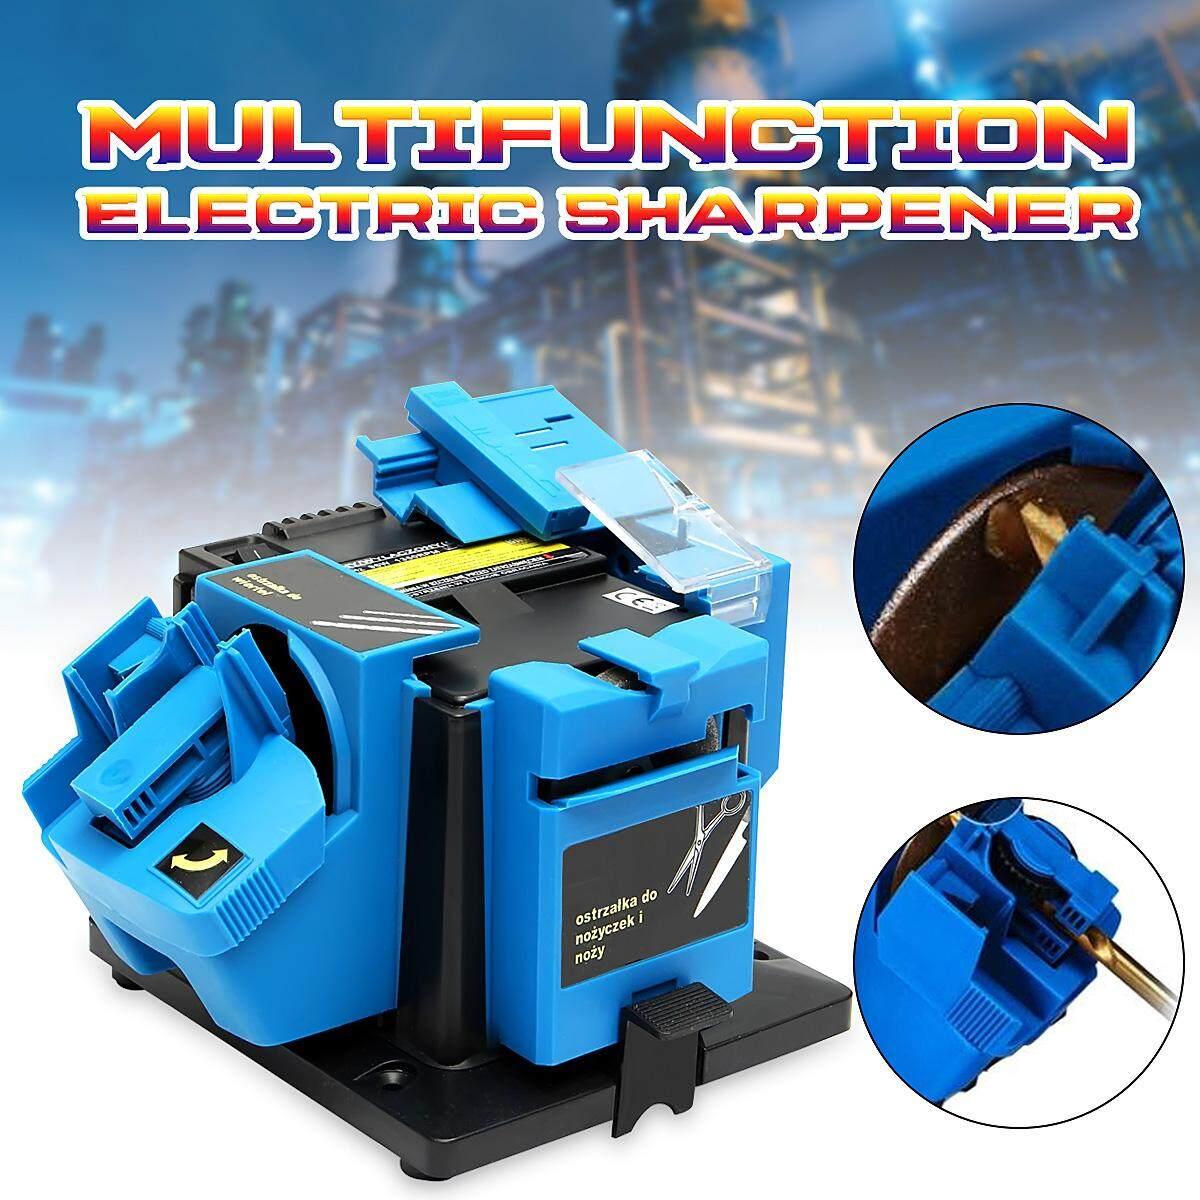 Electric Household Sharpener Tool Drill Bit Knife Scissor Sharpener Grinder